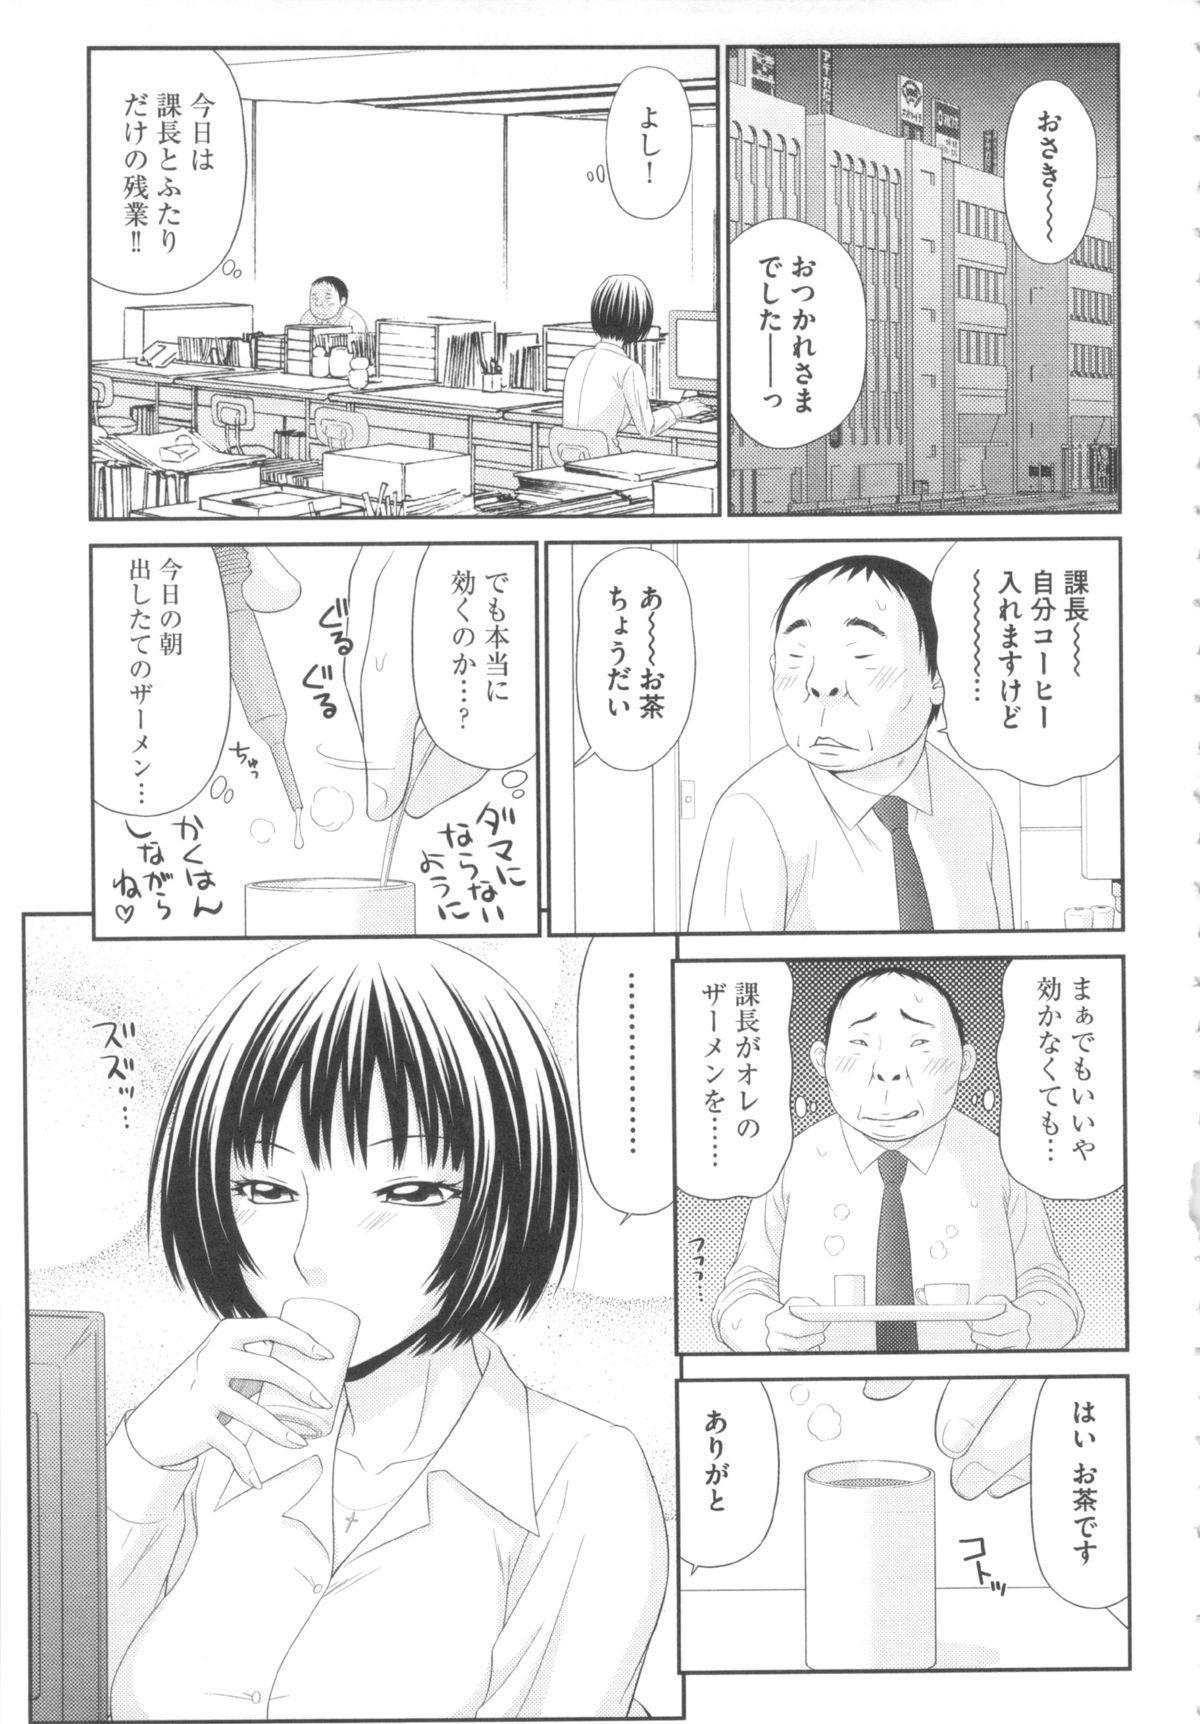 Kiseki No Zaajiru - Sperm of Miracle 11